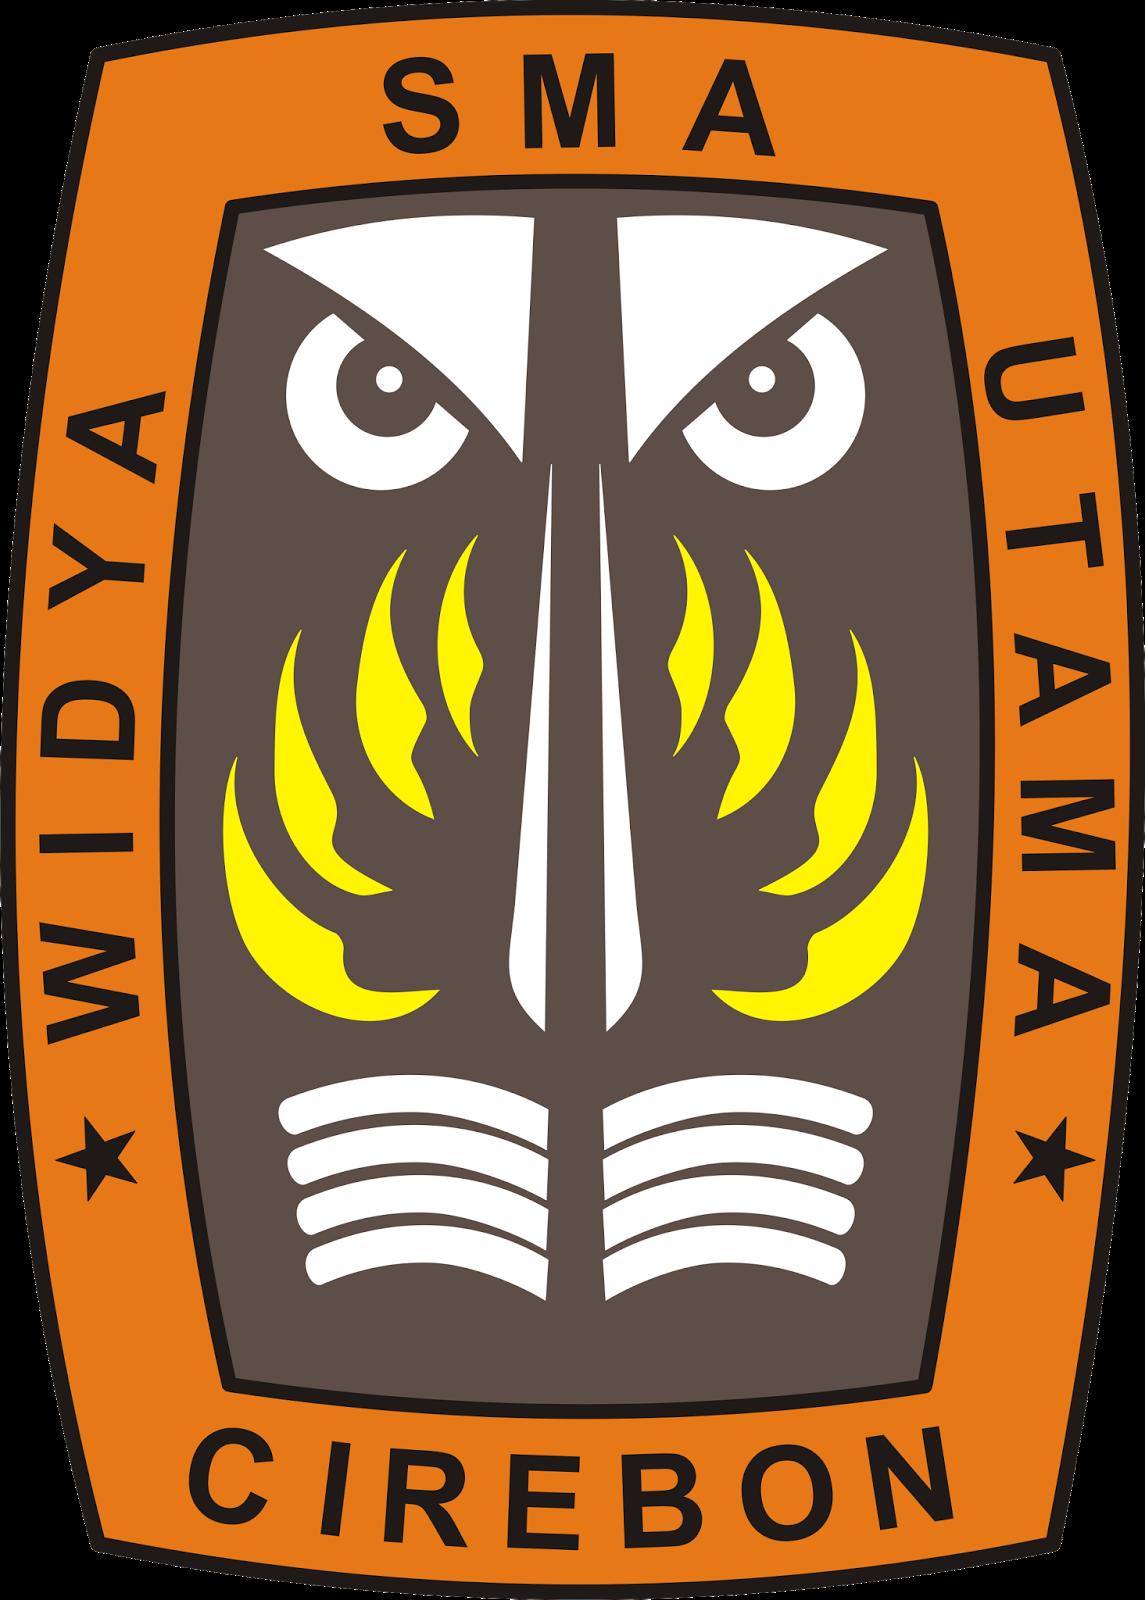 http://desainfarhan.blogspot.com/2014/06/logo-sma-widya-utama-cirebon.html